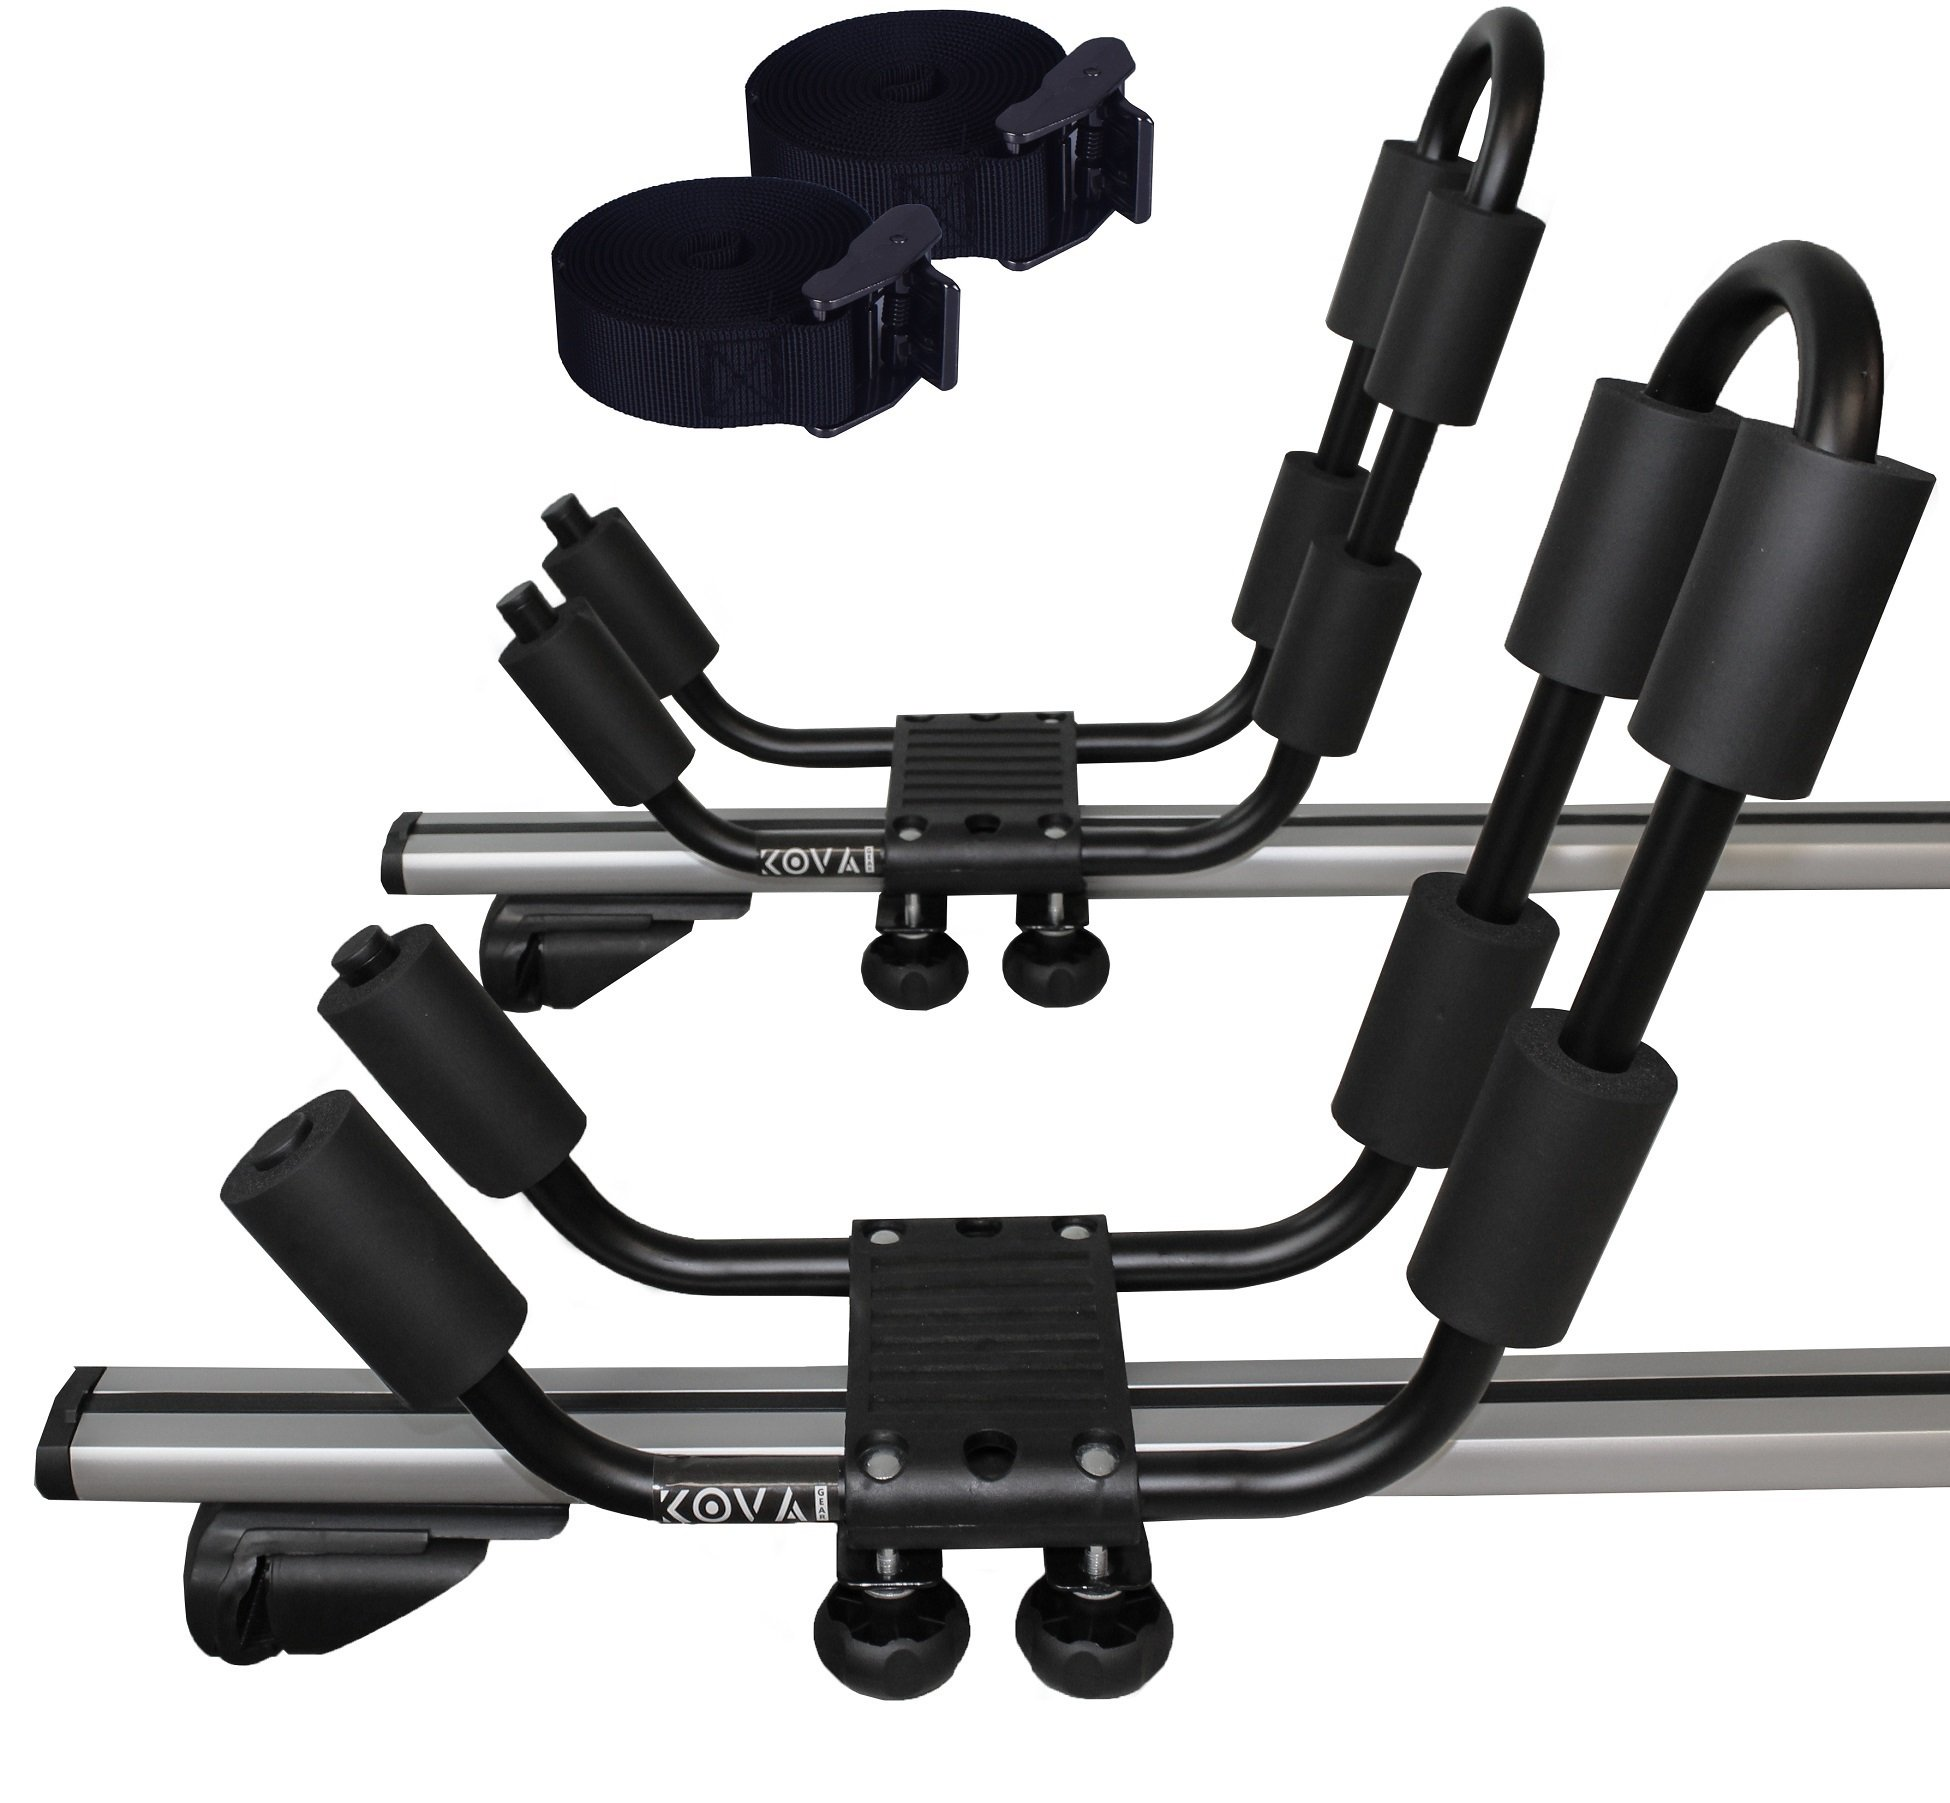 Kova Gear Set of 2 J Bar Kayak Roof Racks Adjustable w/ Easy Install